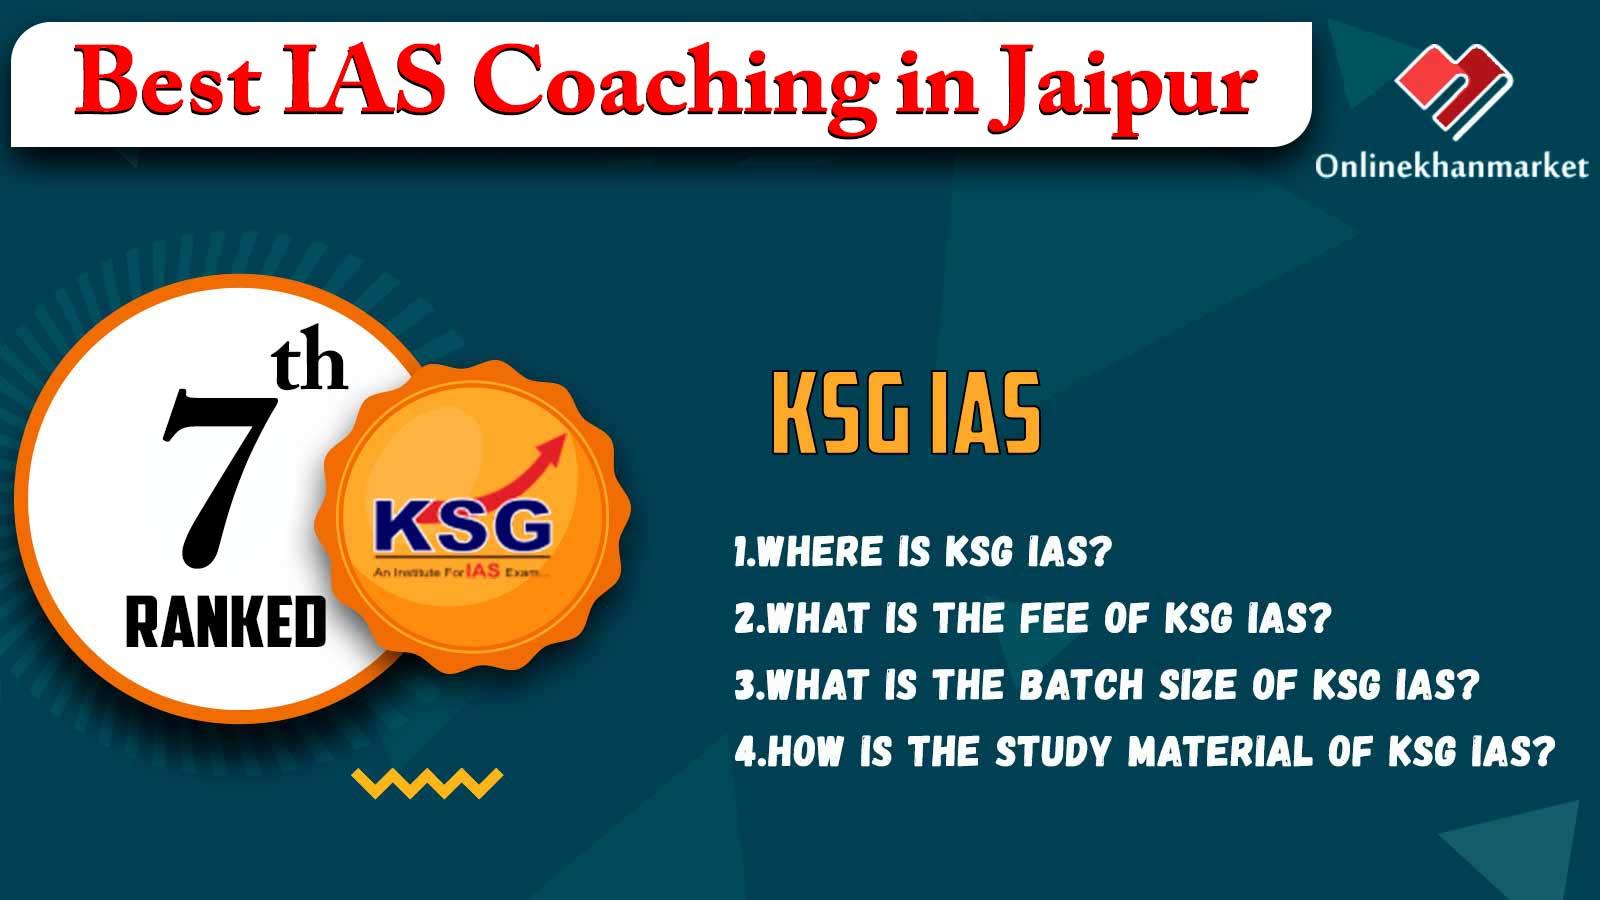 Best UPSC Coaching in Jaipur